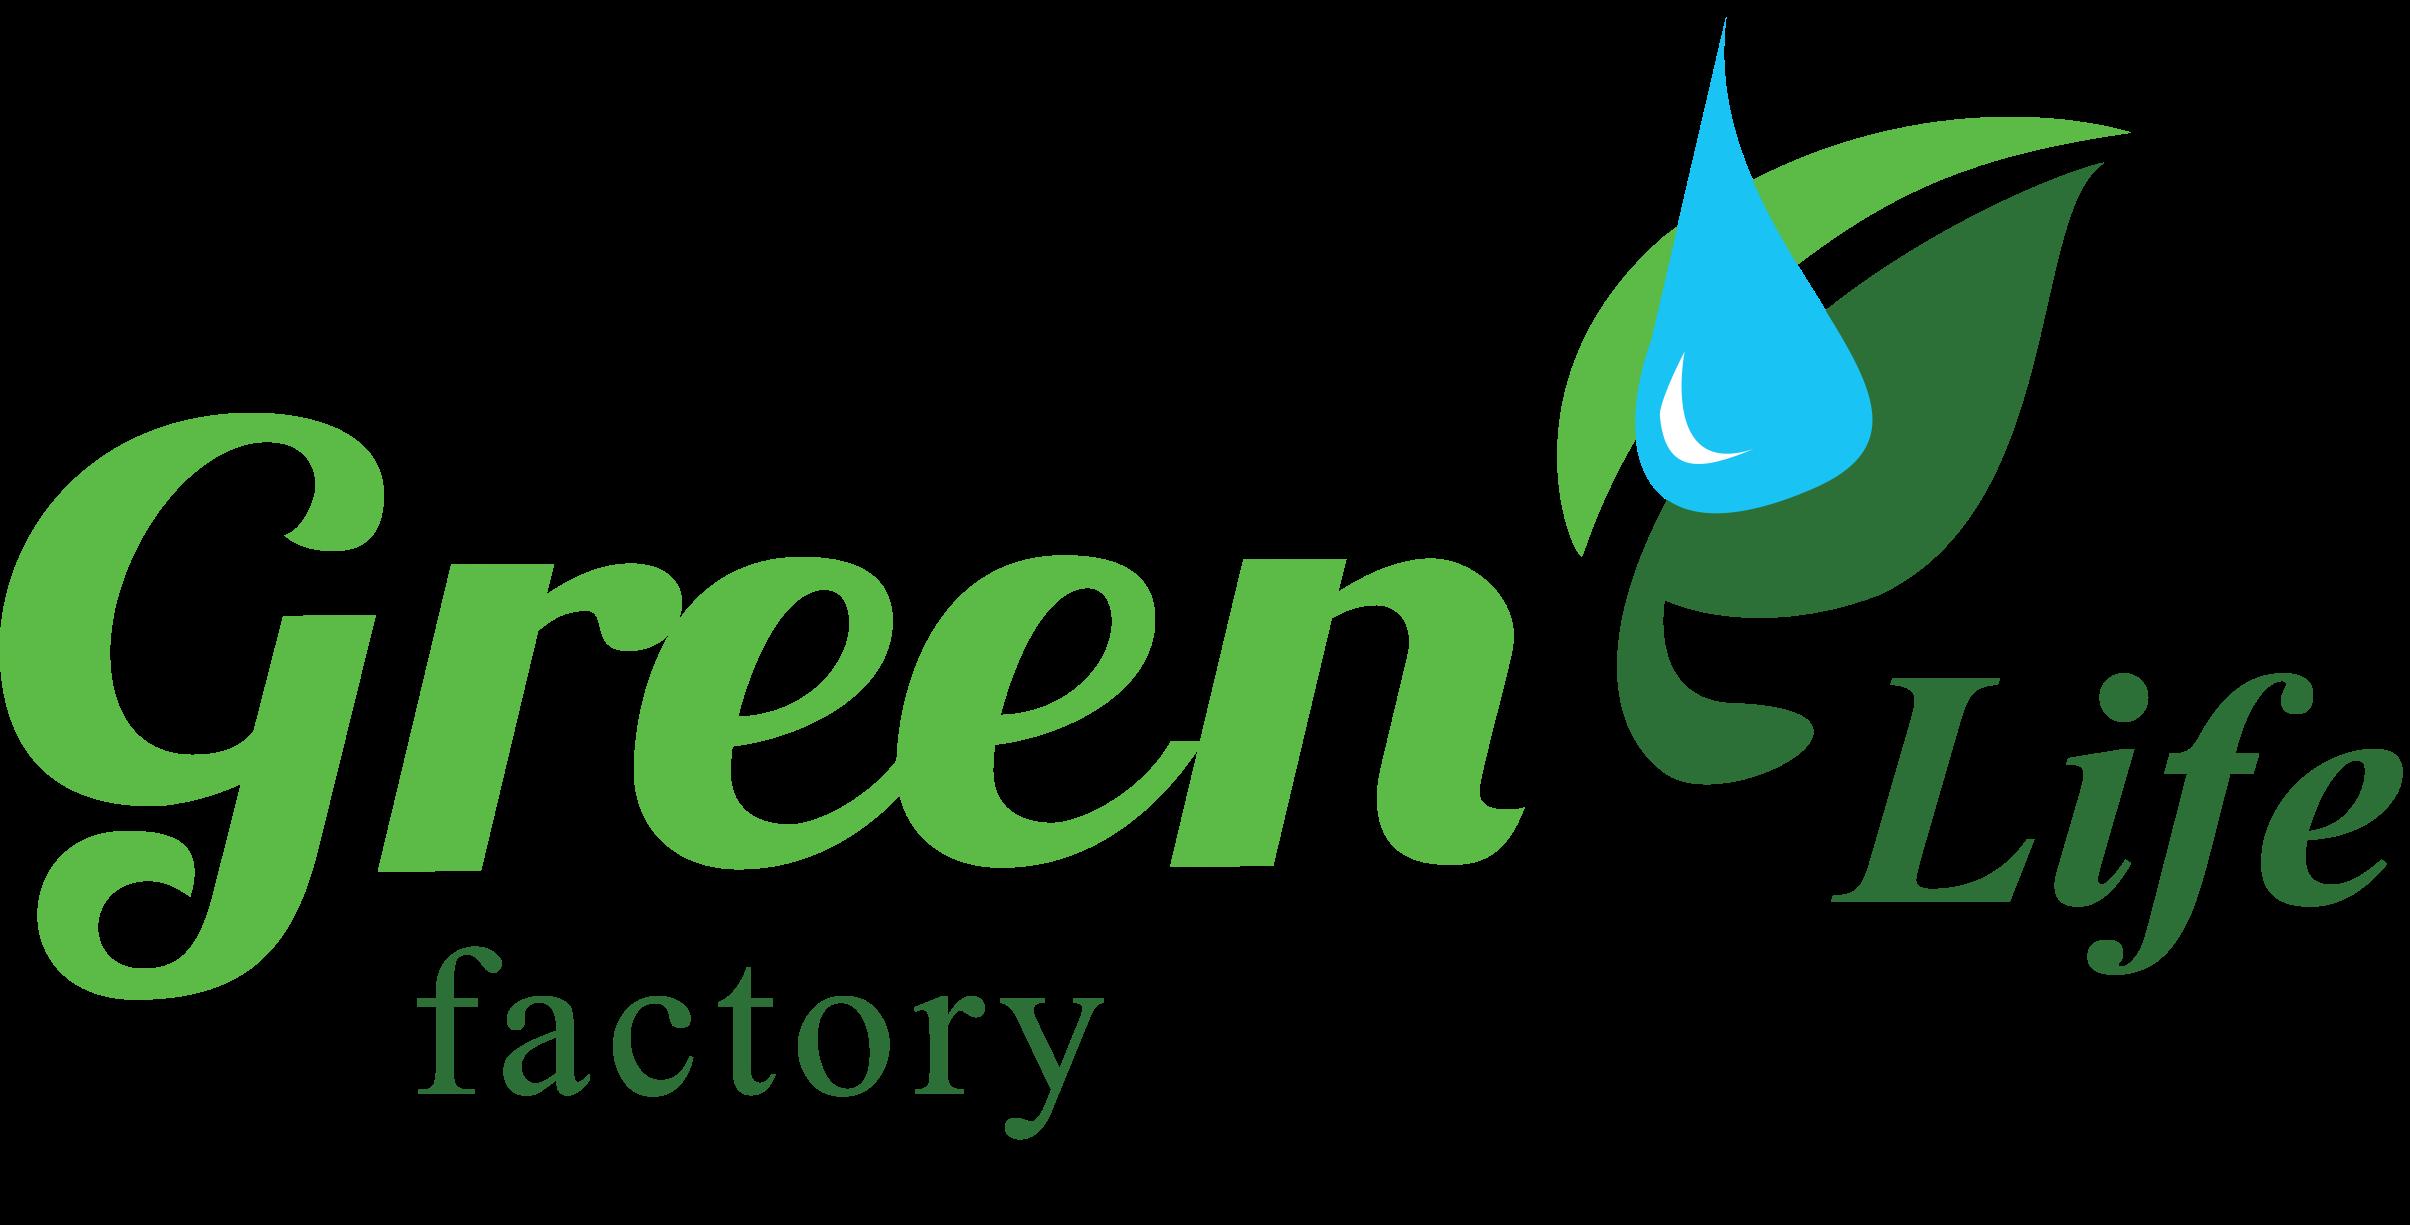 greenlife factory flocculant гринлайф фэктори флокулянт